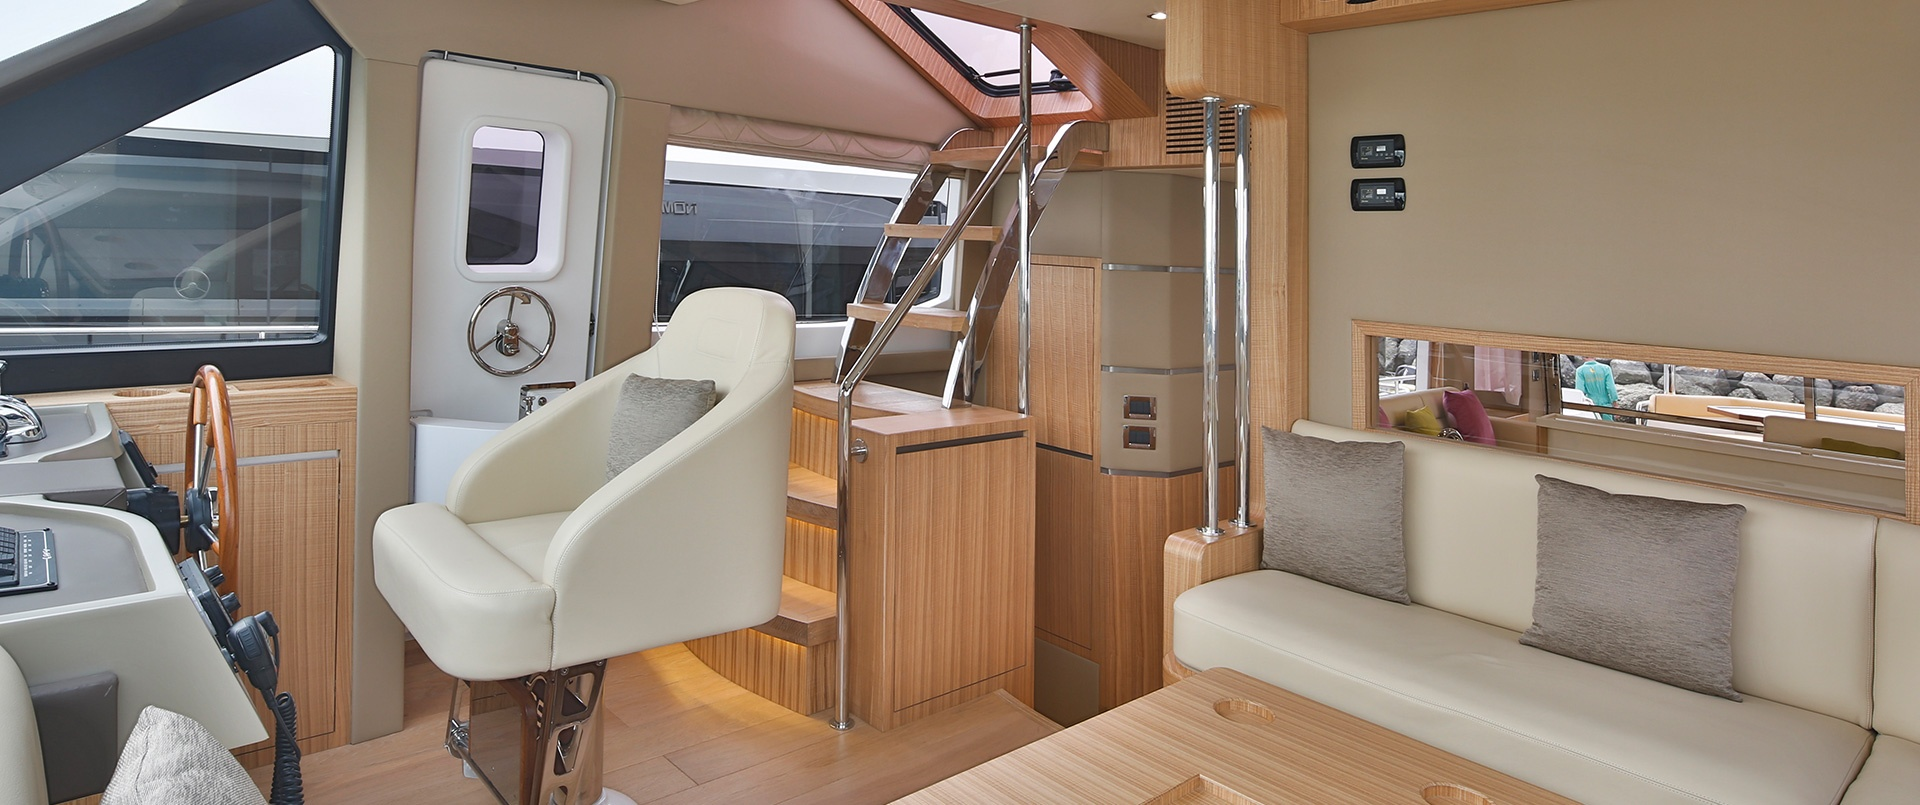 nomad-65-saloon.jpg